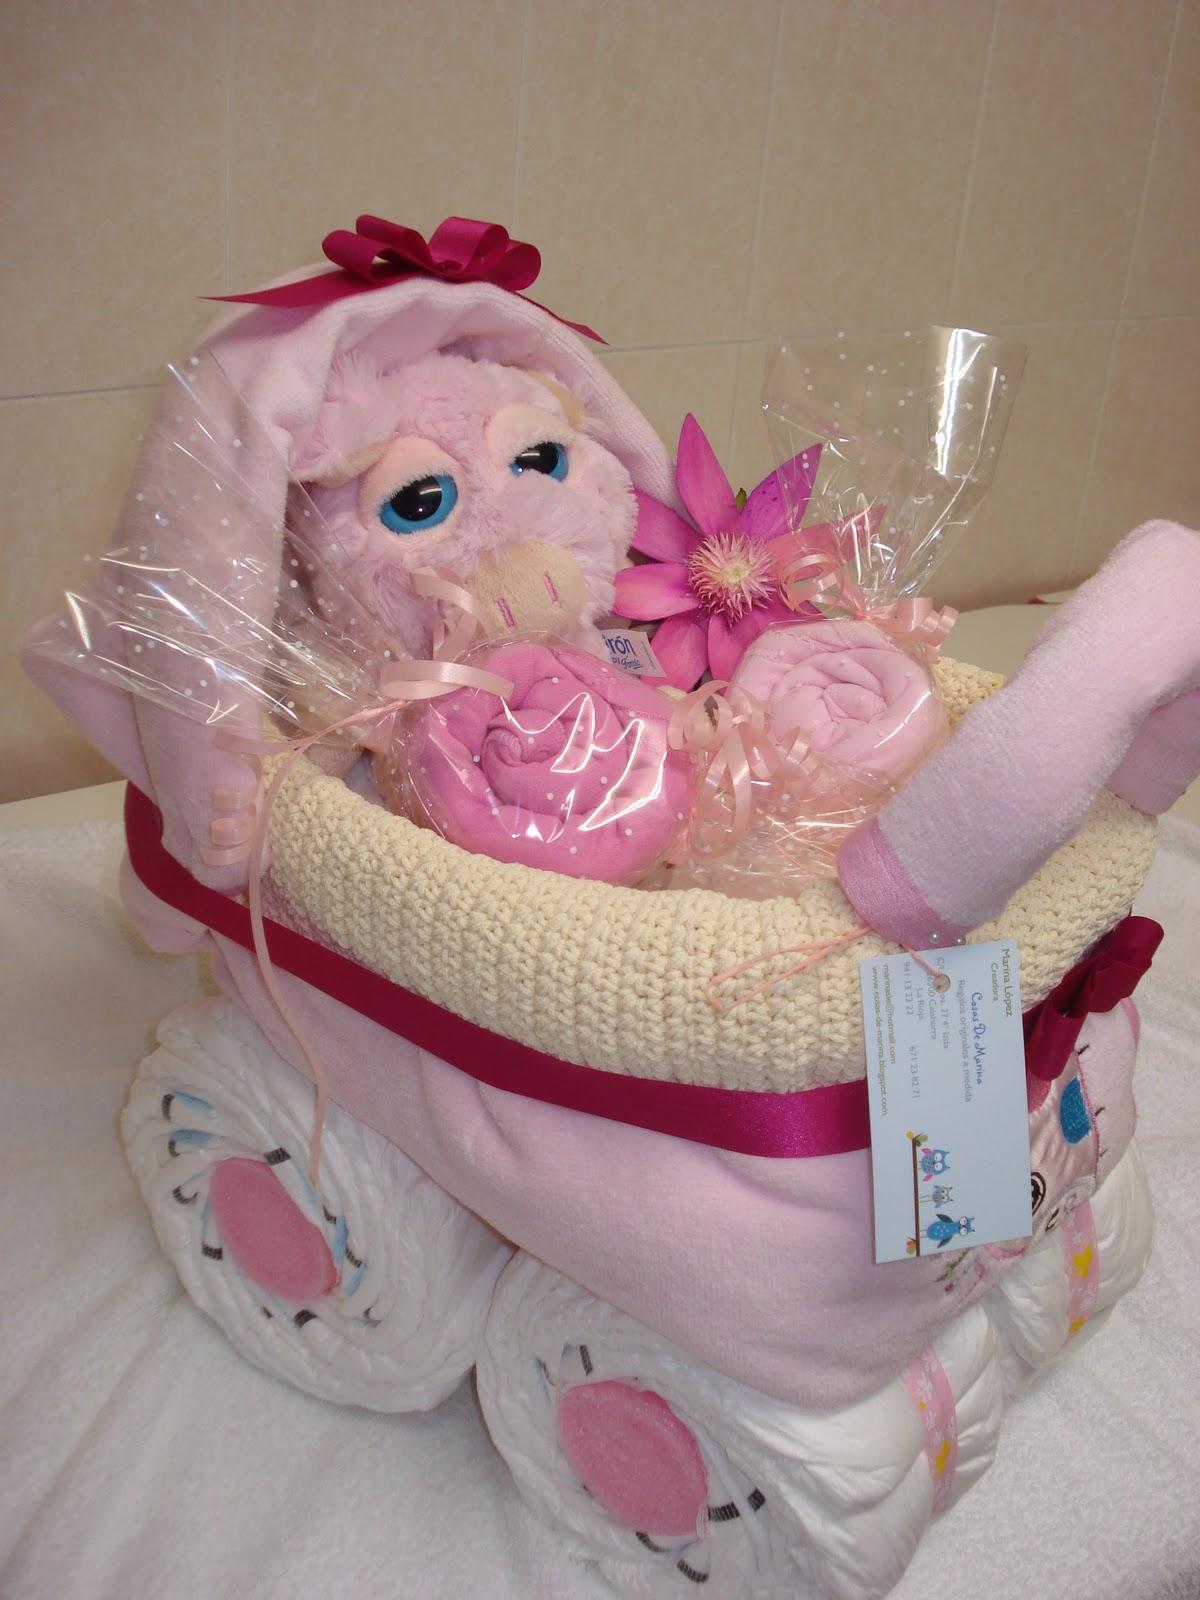 a8d9beb11125 40 Pañales talla de 3 a 6 kg. - Juego de tres toallas de baño para el bebé.  -2 Bodys ML talla de 0 a 3 meses. - 1 Peluche suavinex. - 1 Cesta.